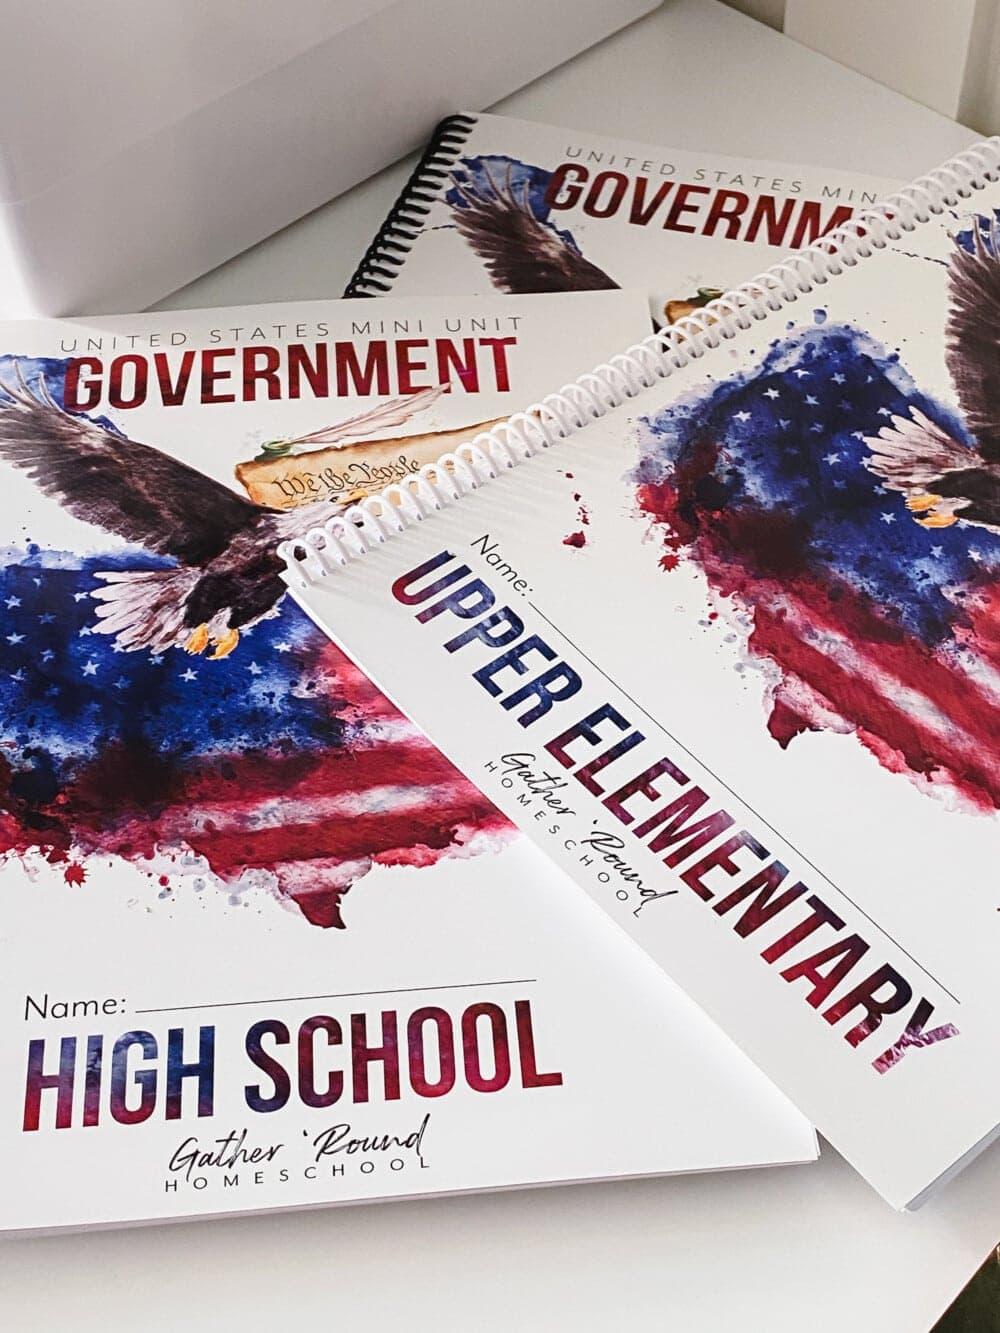 gather round homeschool government 4th grade homeschool curriculum